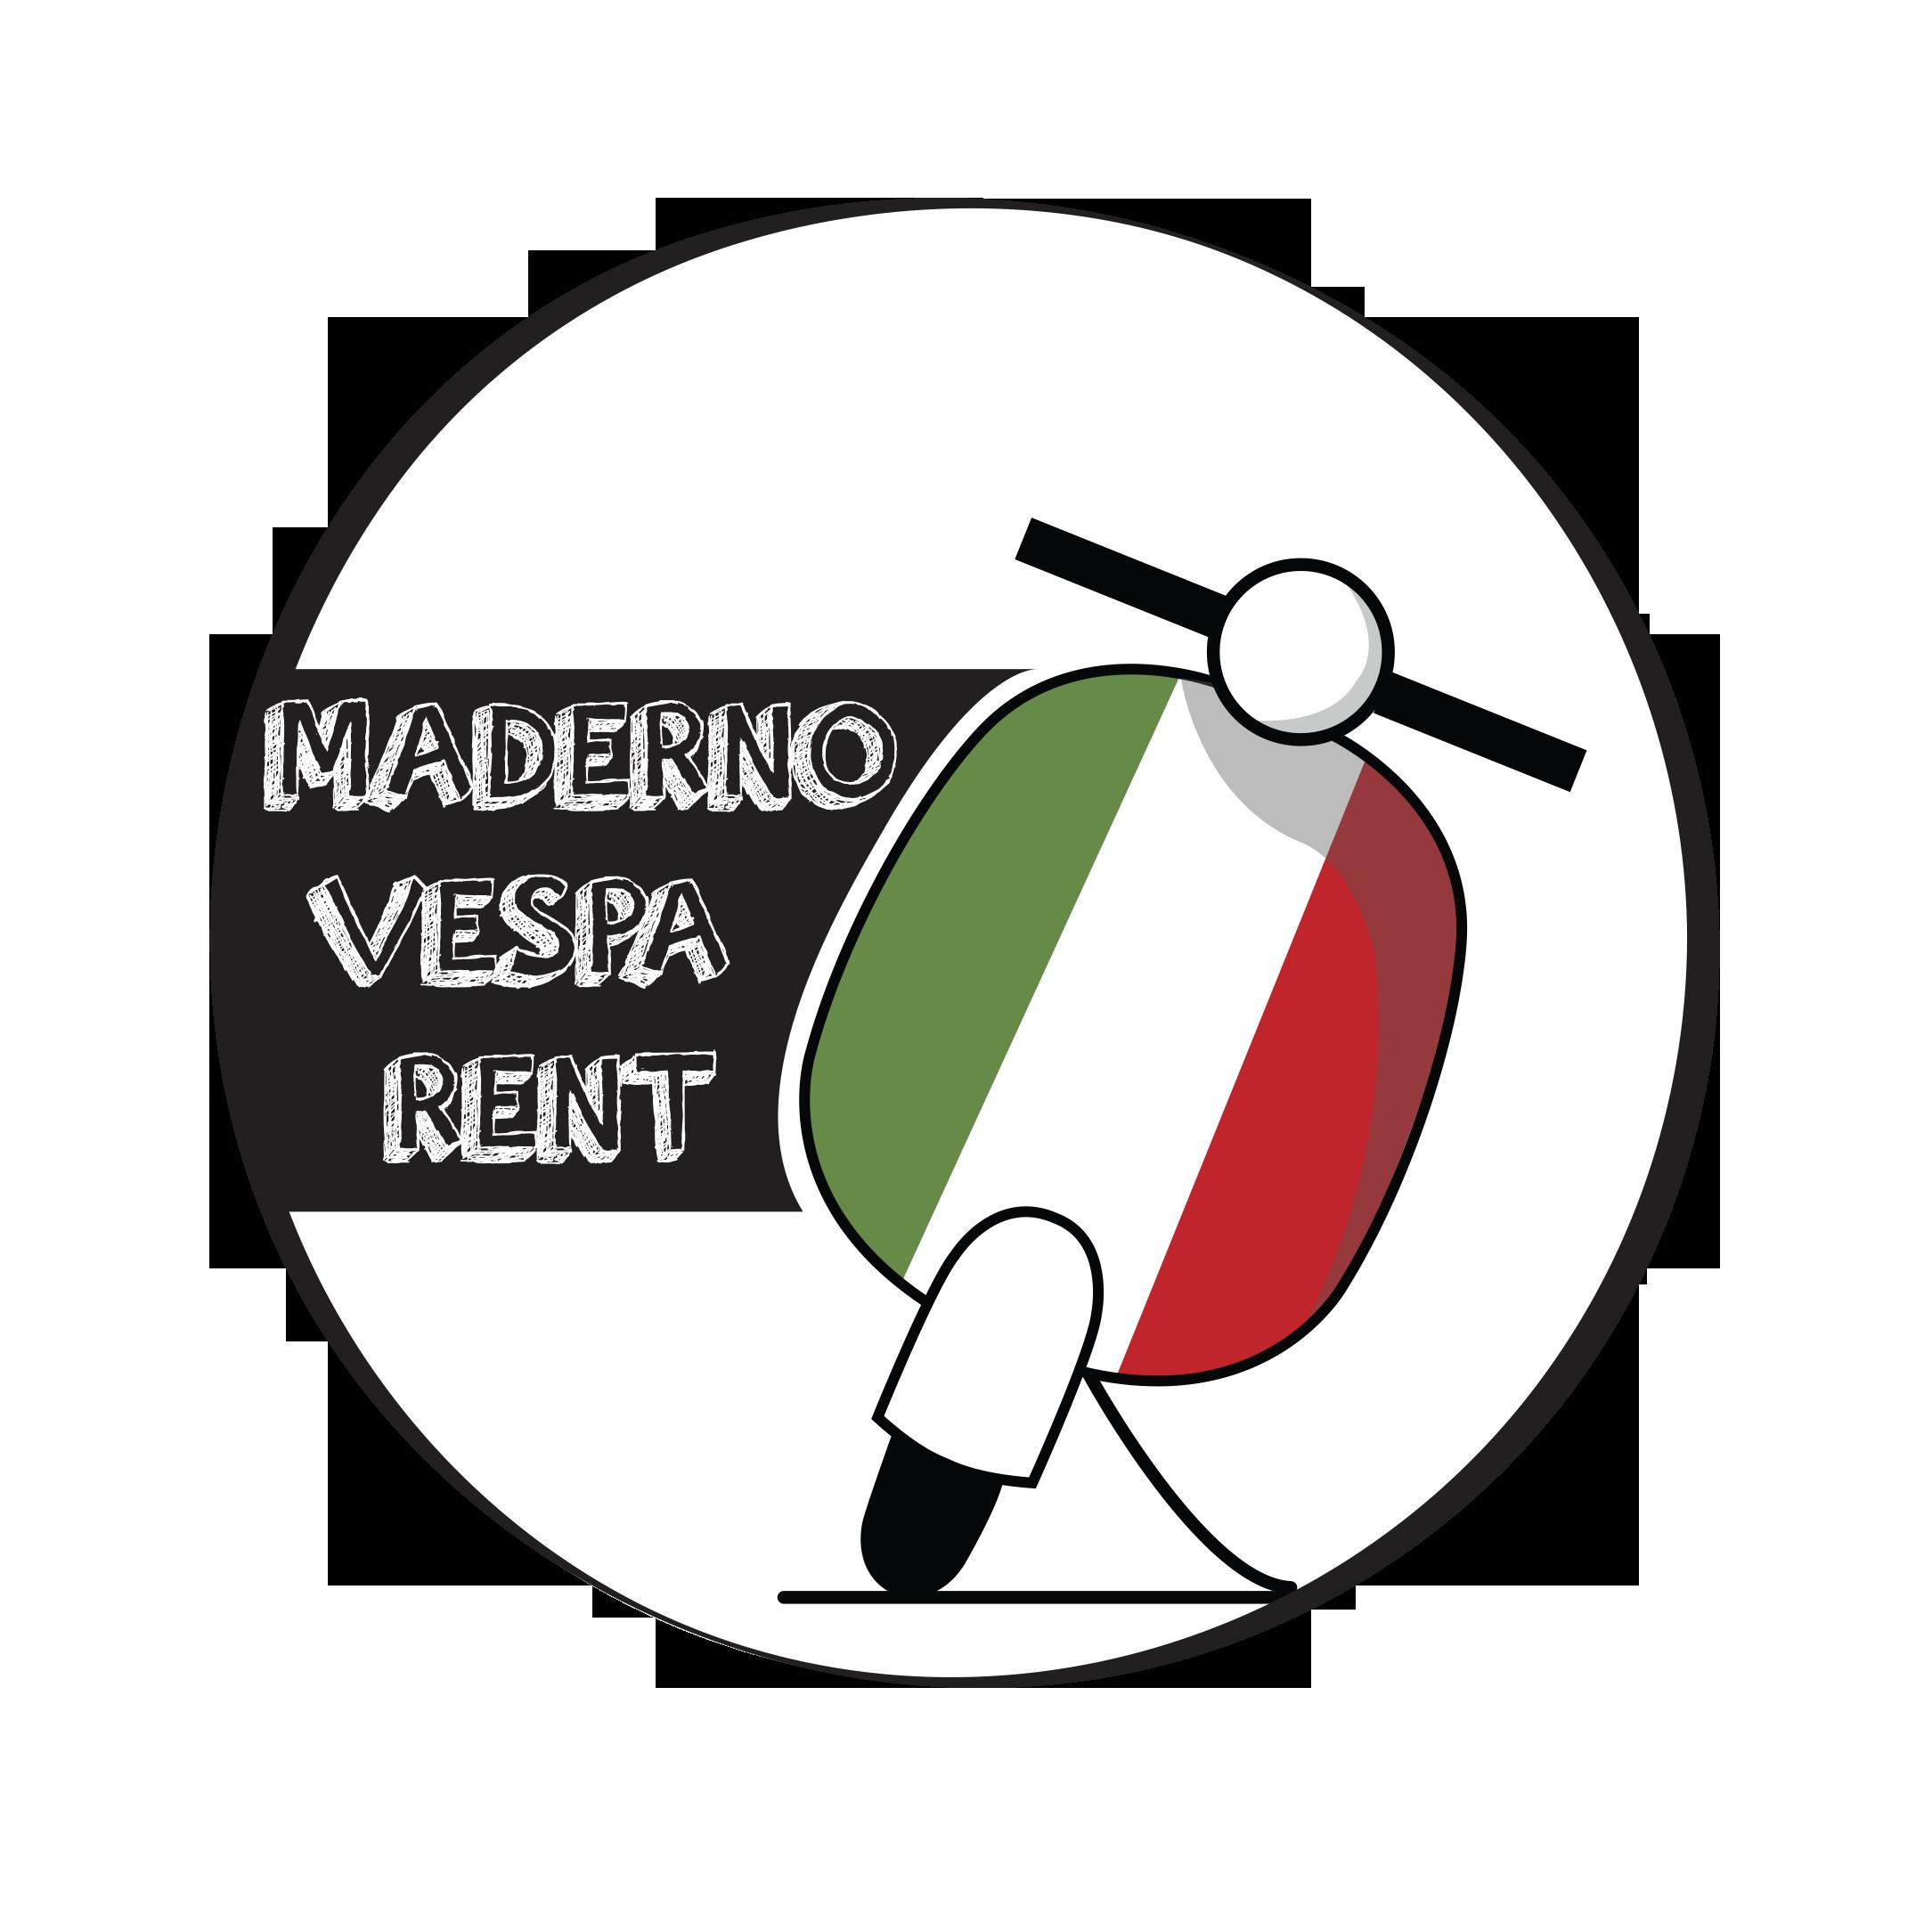 Maderno Vespa Rent Logo